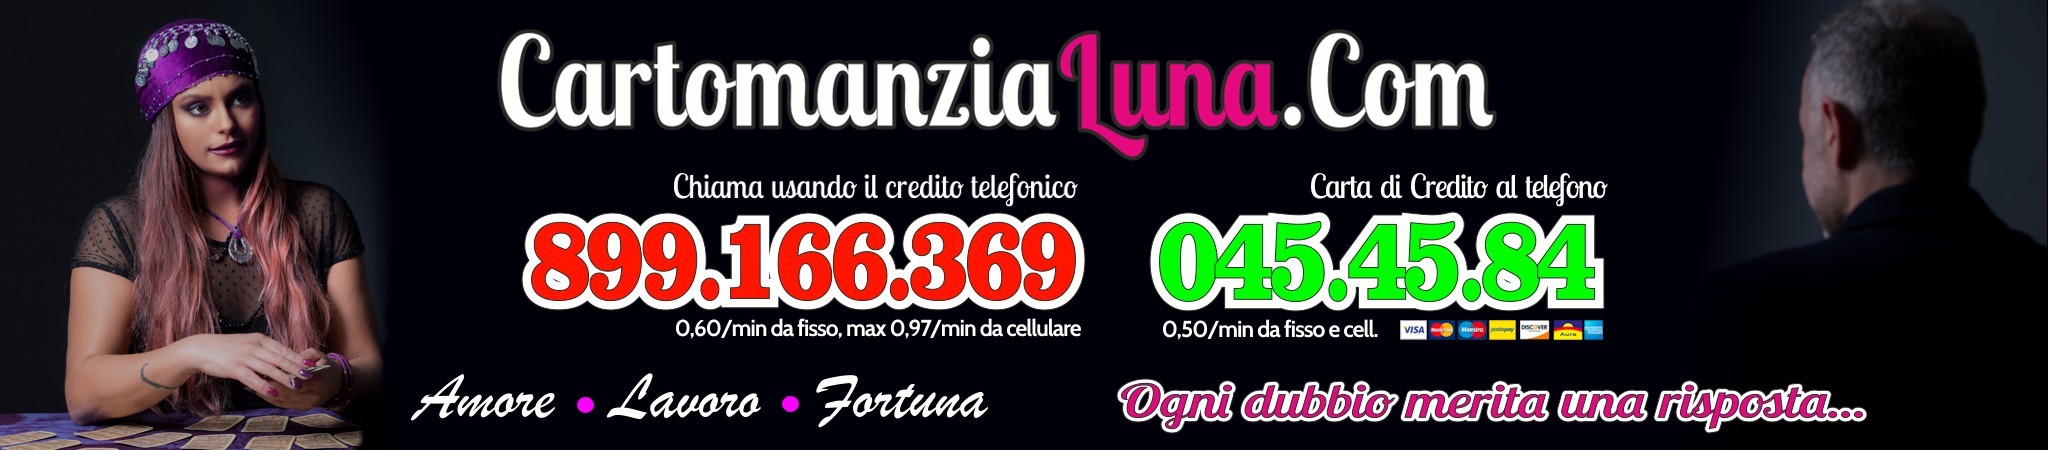 Cartomanzia Luna